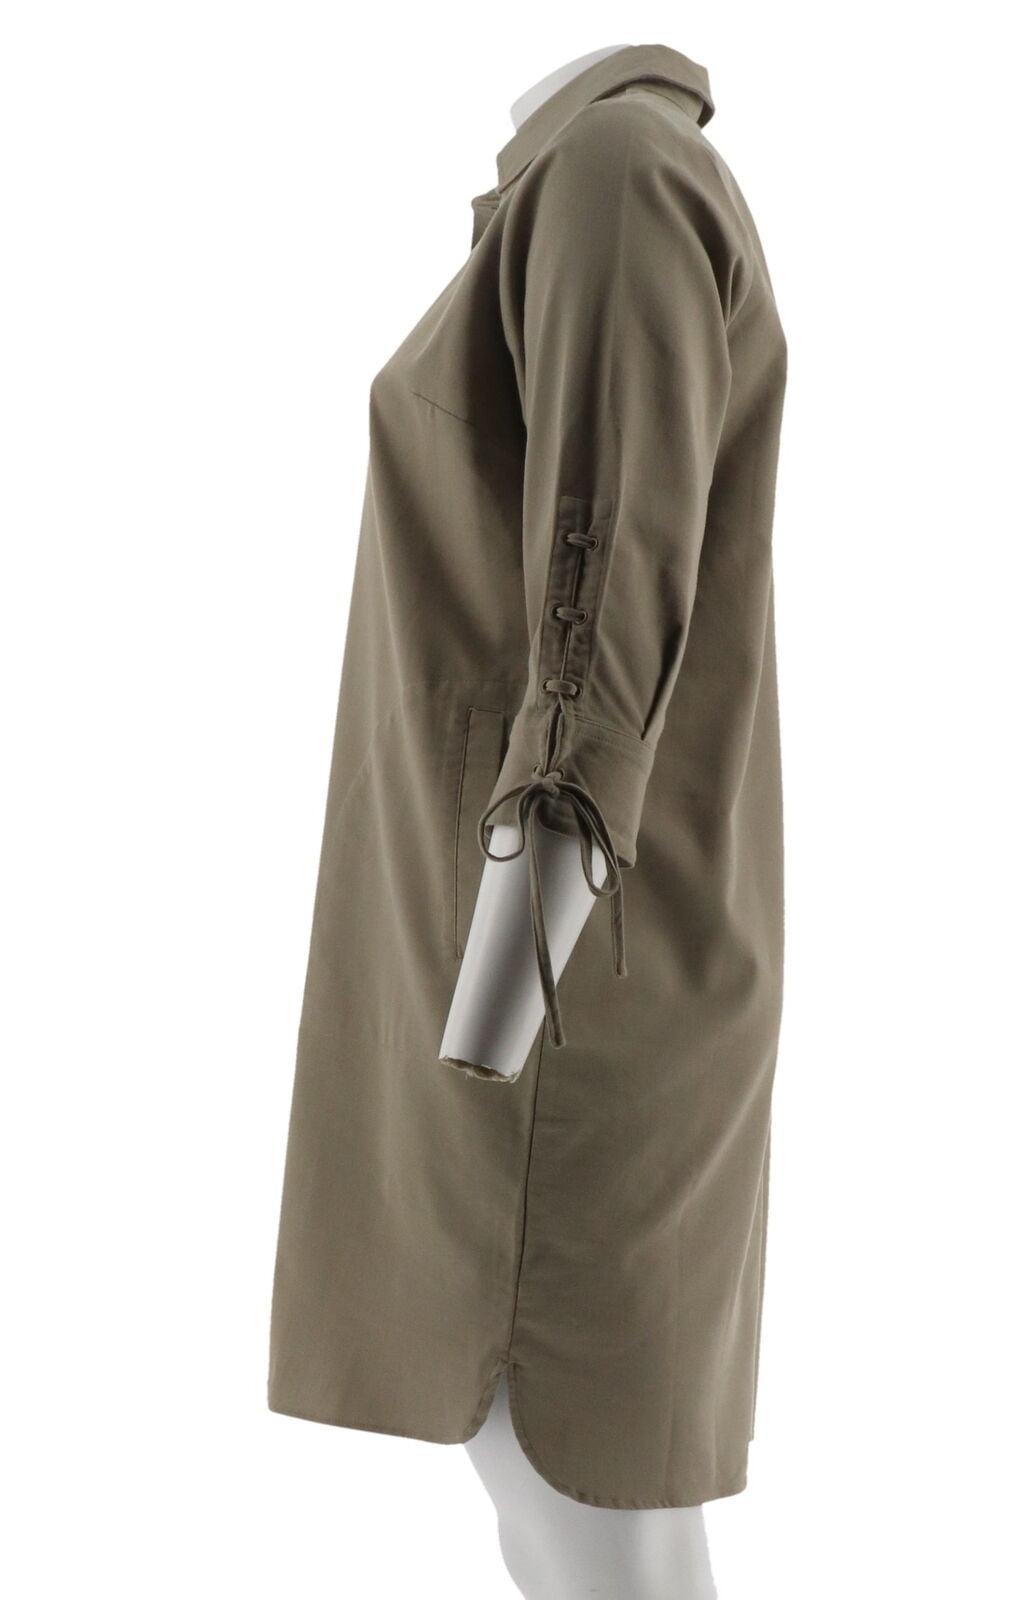 Linea Louis Dell/'Olio Stretch Denim Dress Lace Up Slv Camo XL NEW A304747